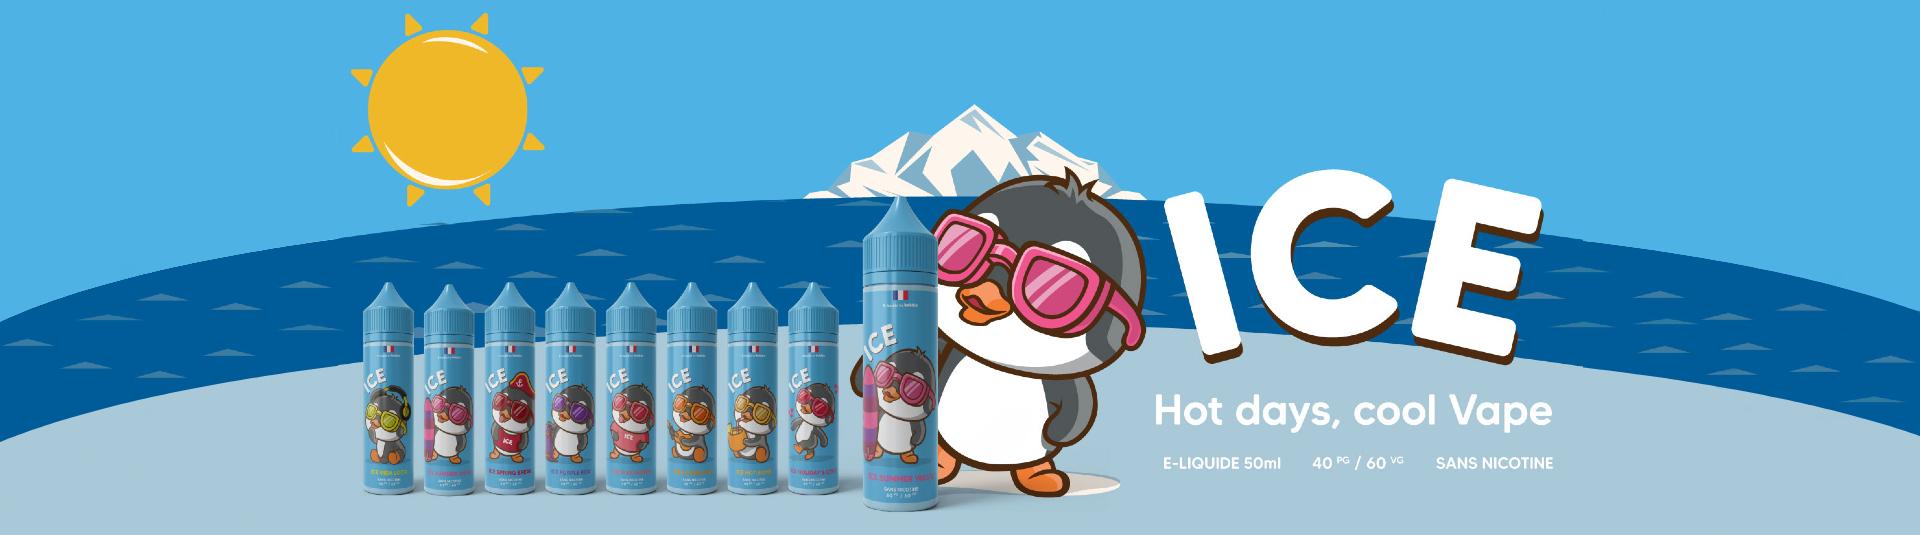 e-liquide-ice-bobble-vape-shop-bain-de-bretagne